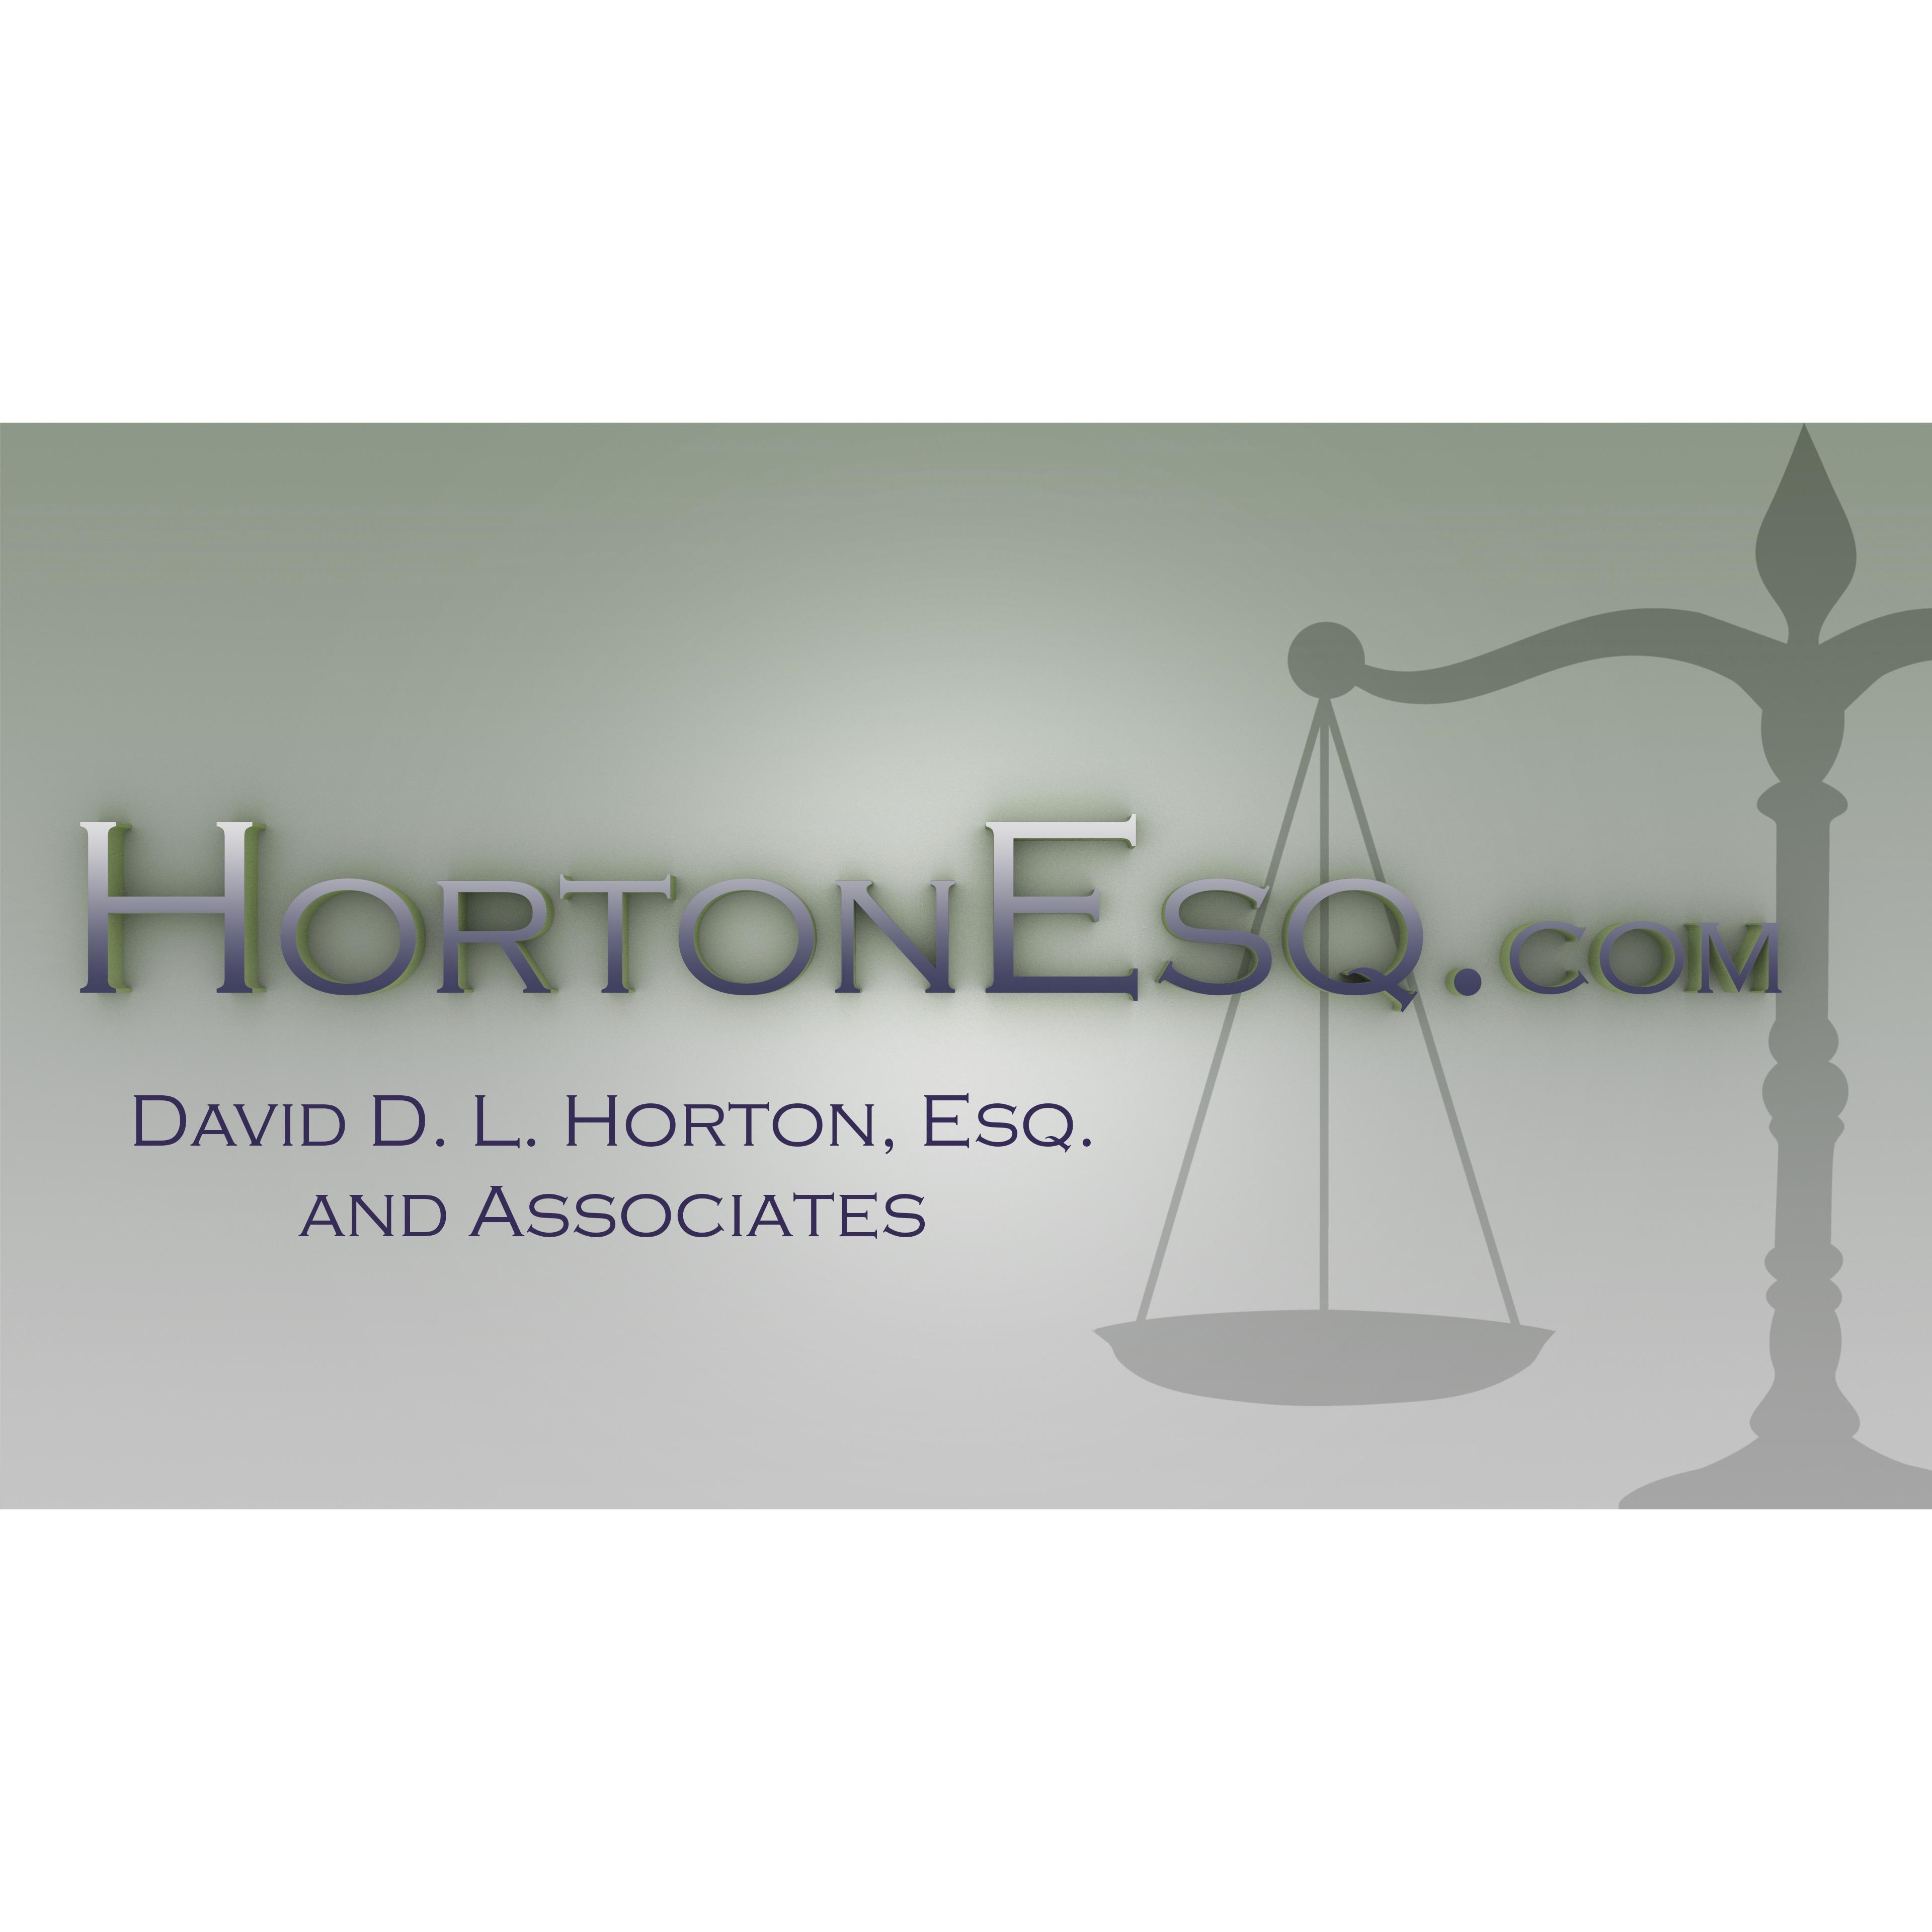 Attorney Riverside CA | David DL Horton Esq & Assoc.